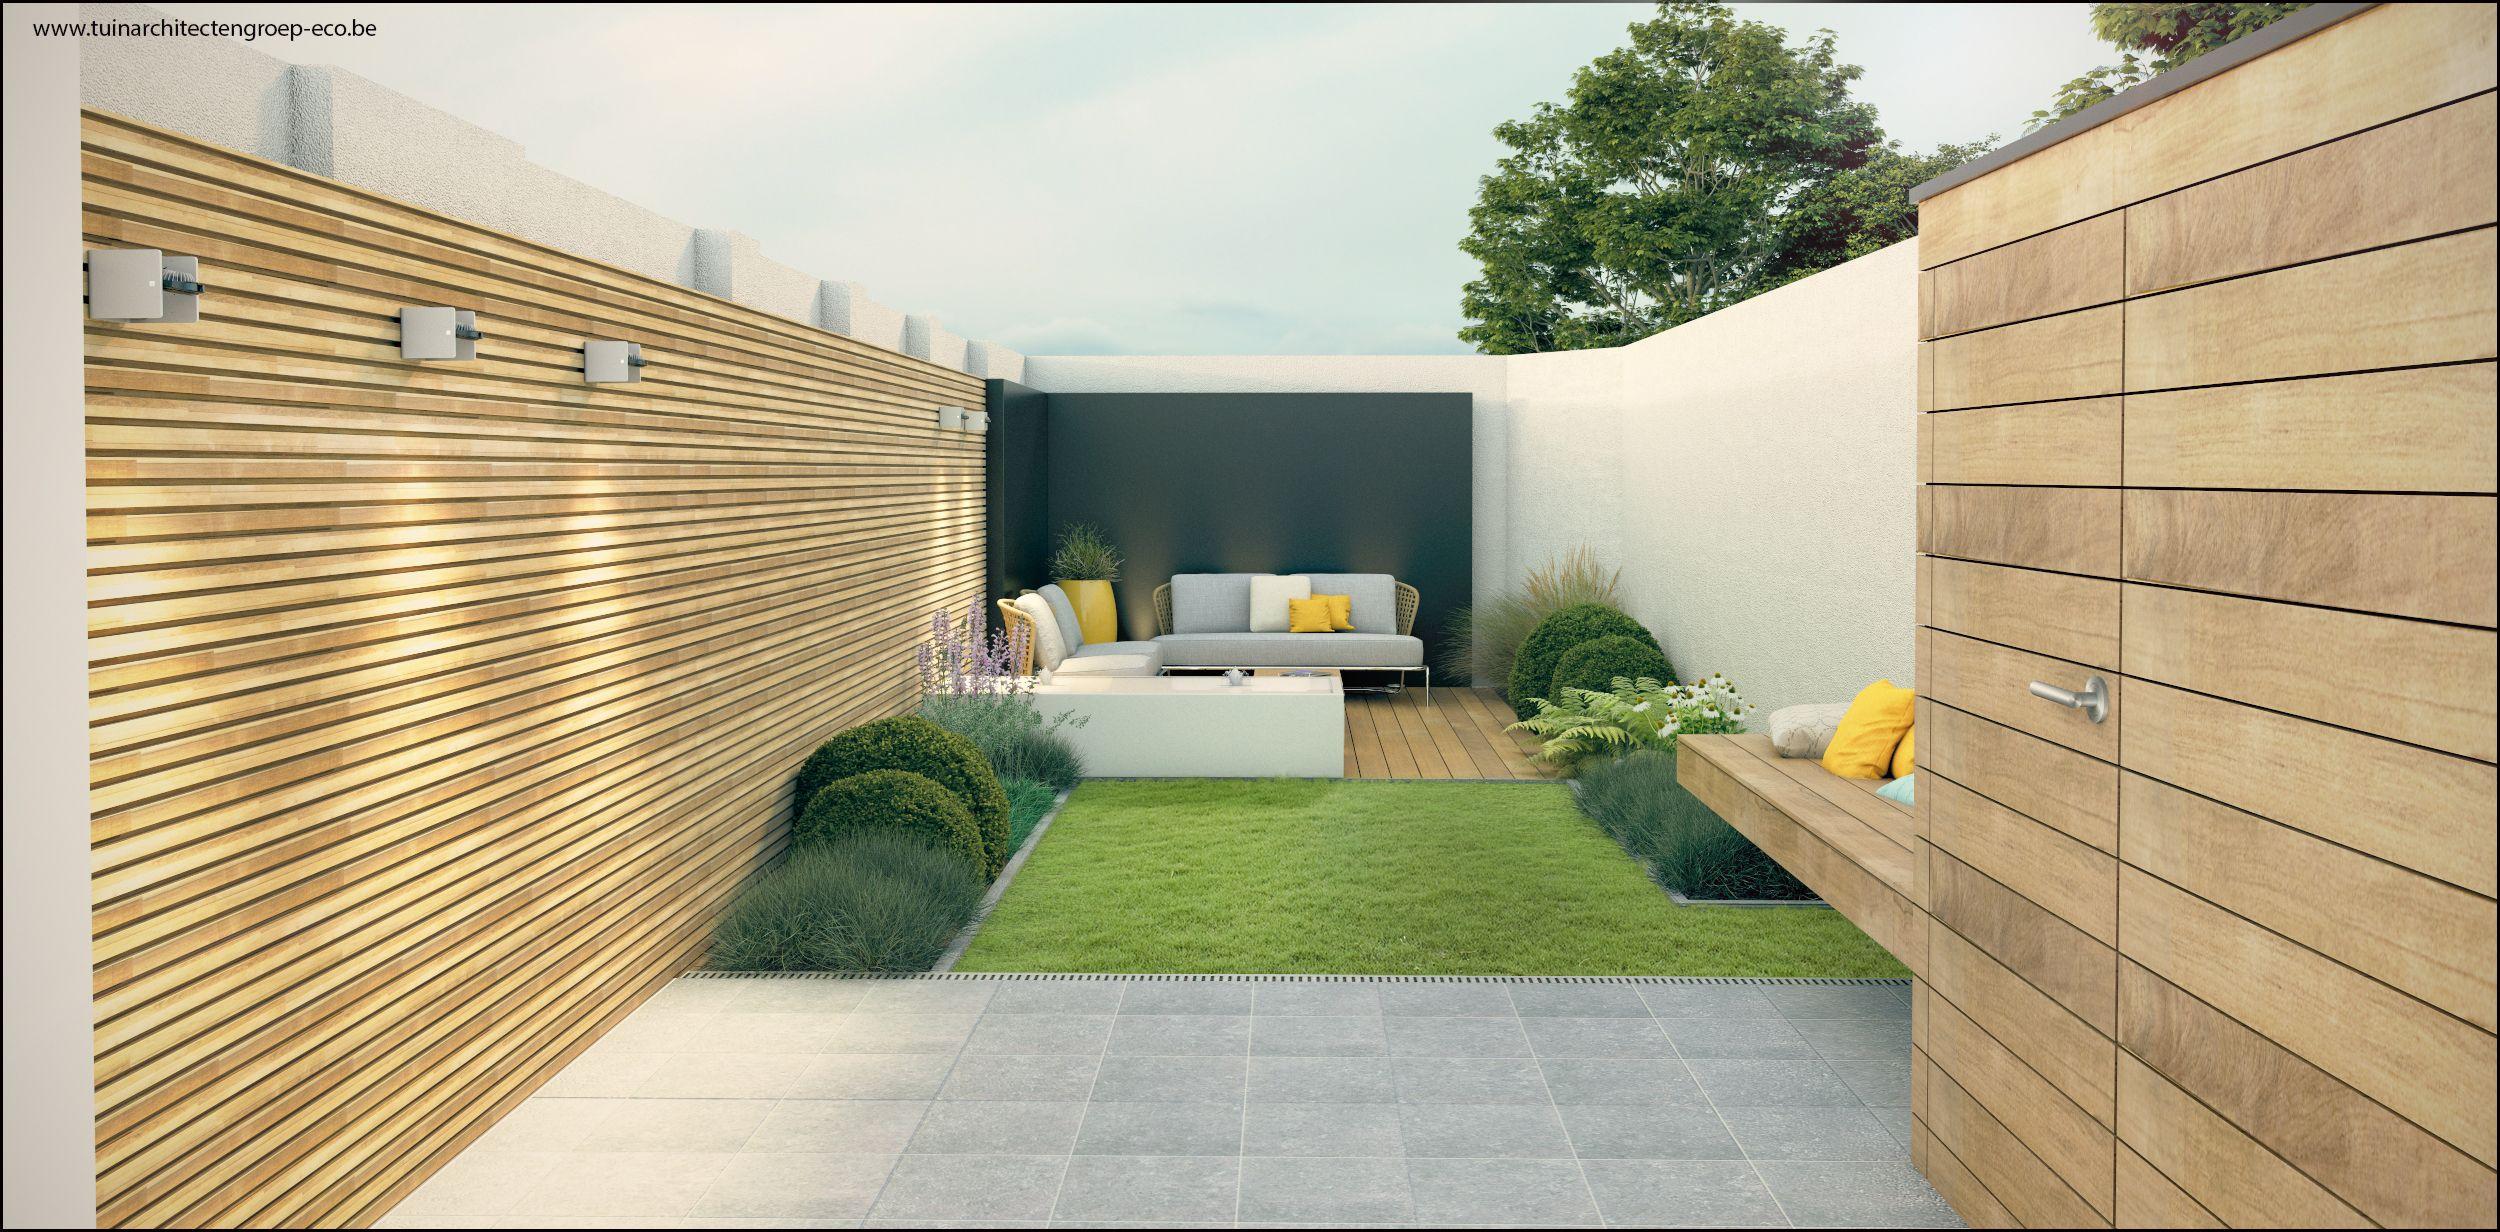 Tuinontwerp kleine stadstuin tuinarchitect timothy cools for Tuinarchitect kleine tuin